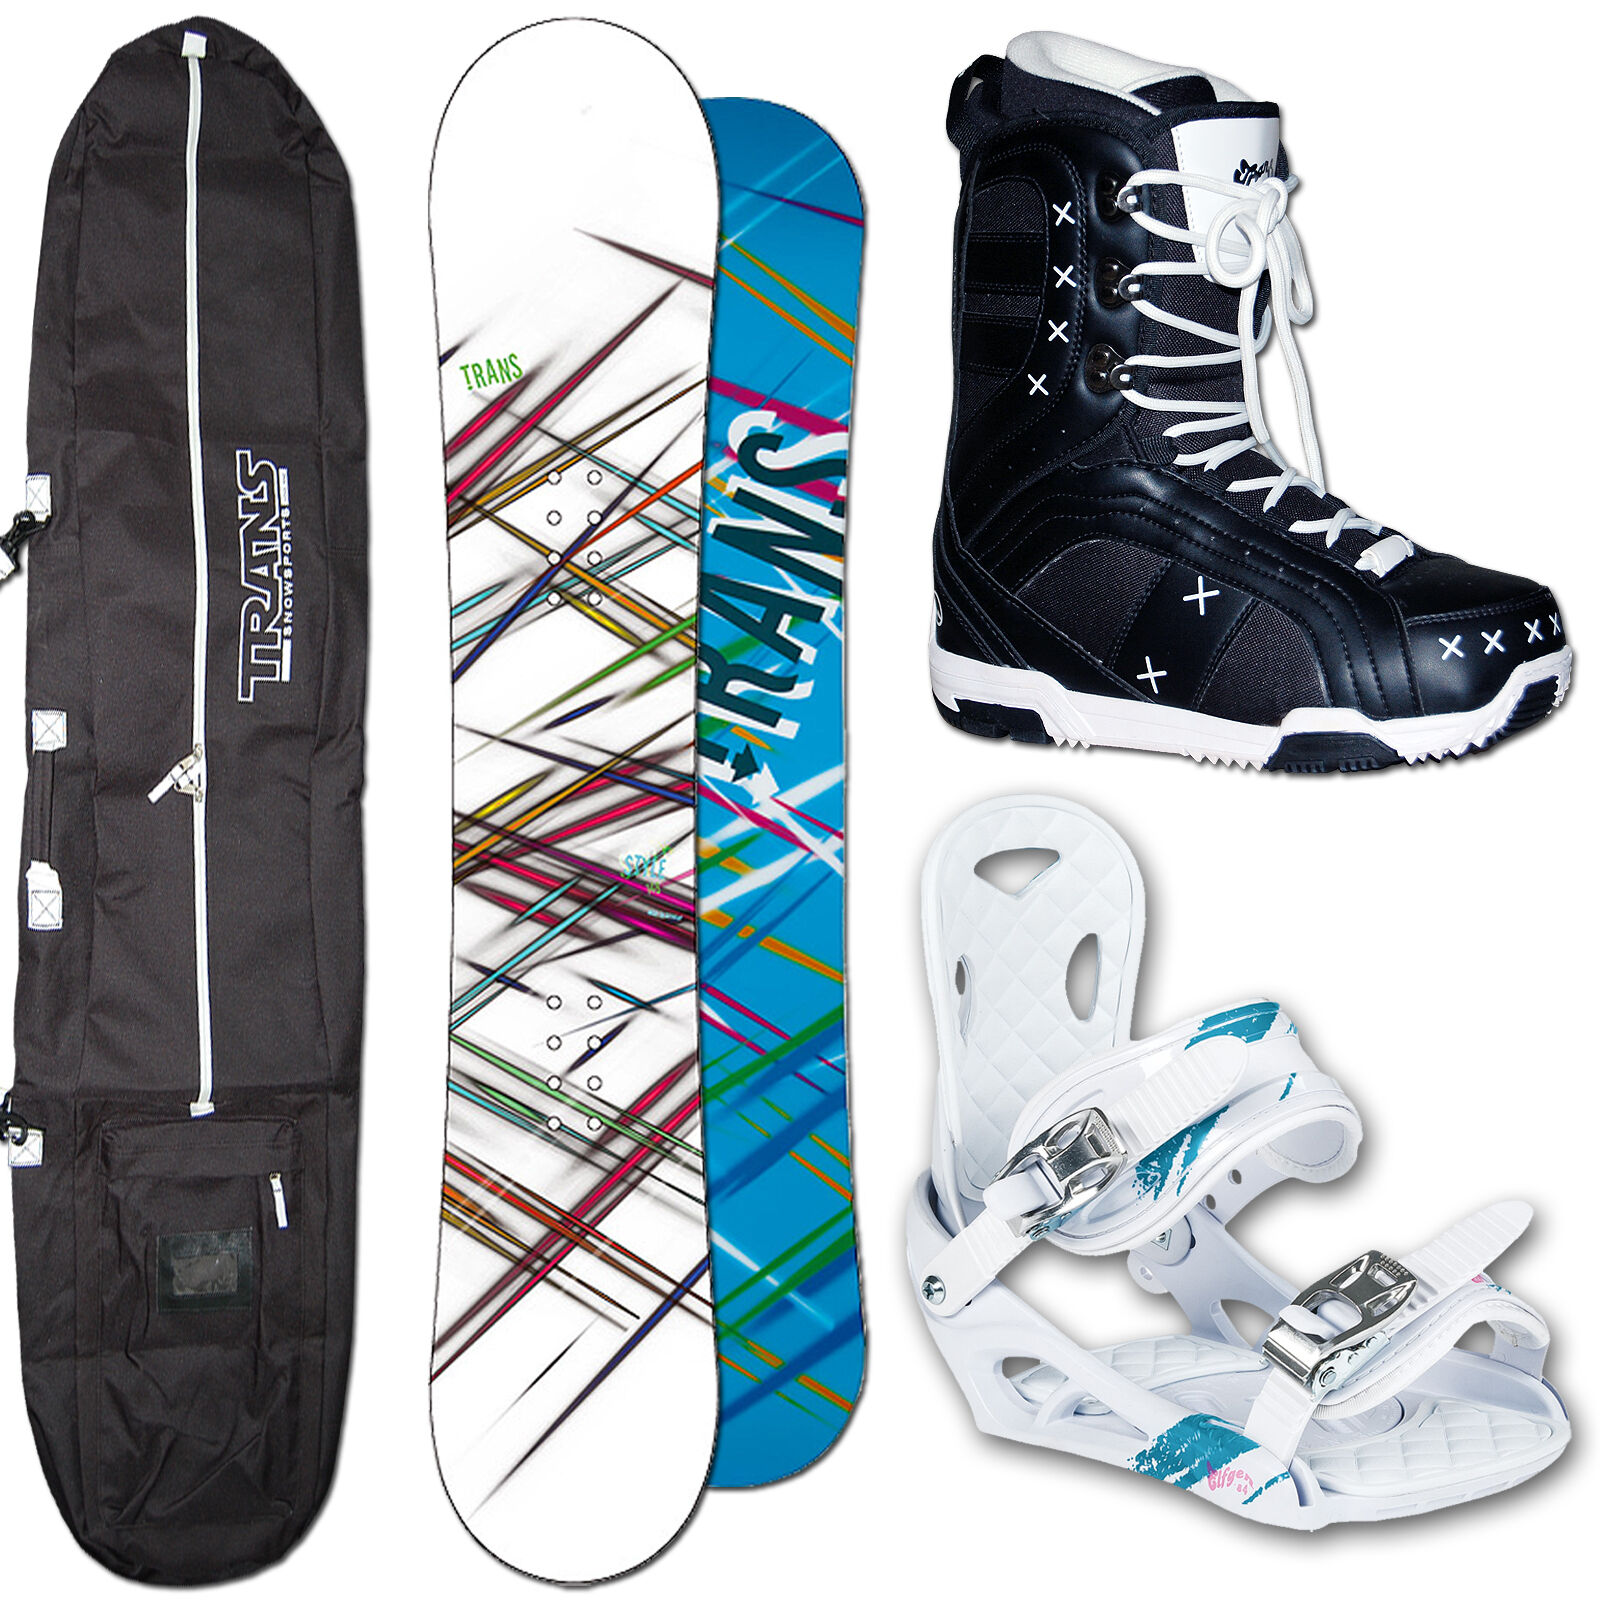 Trans-style femmes snowboard 156 cm + eleven eco genetics liaison m + sac +